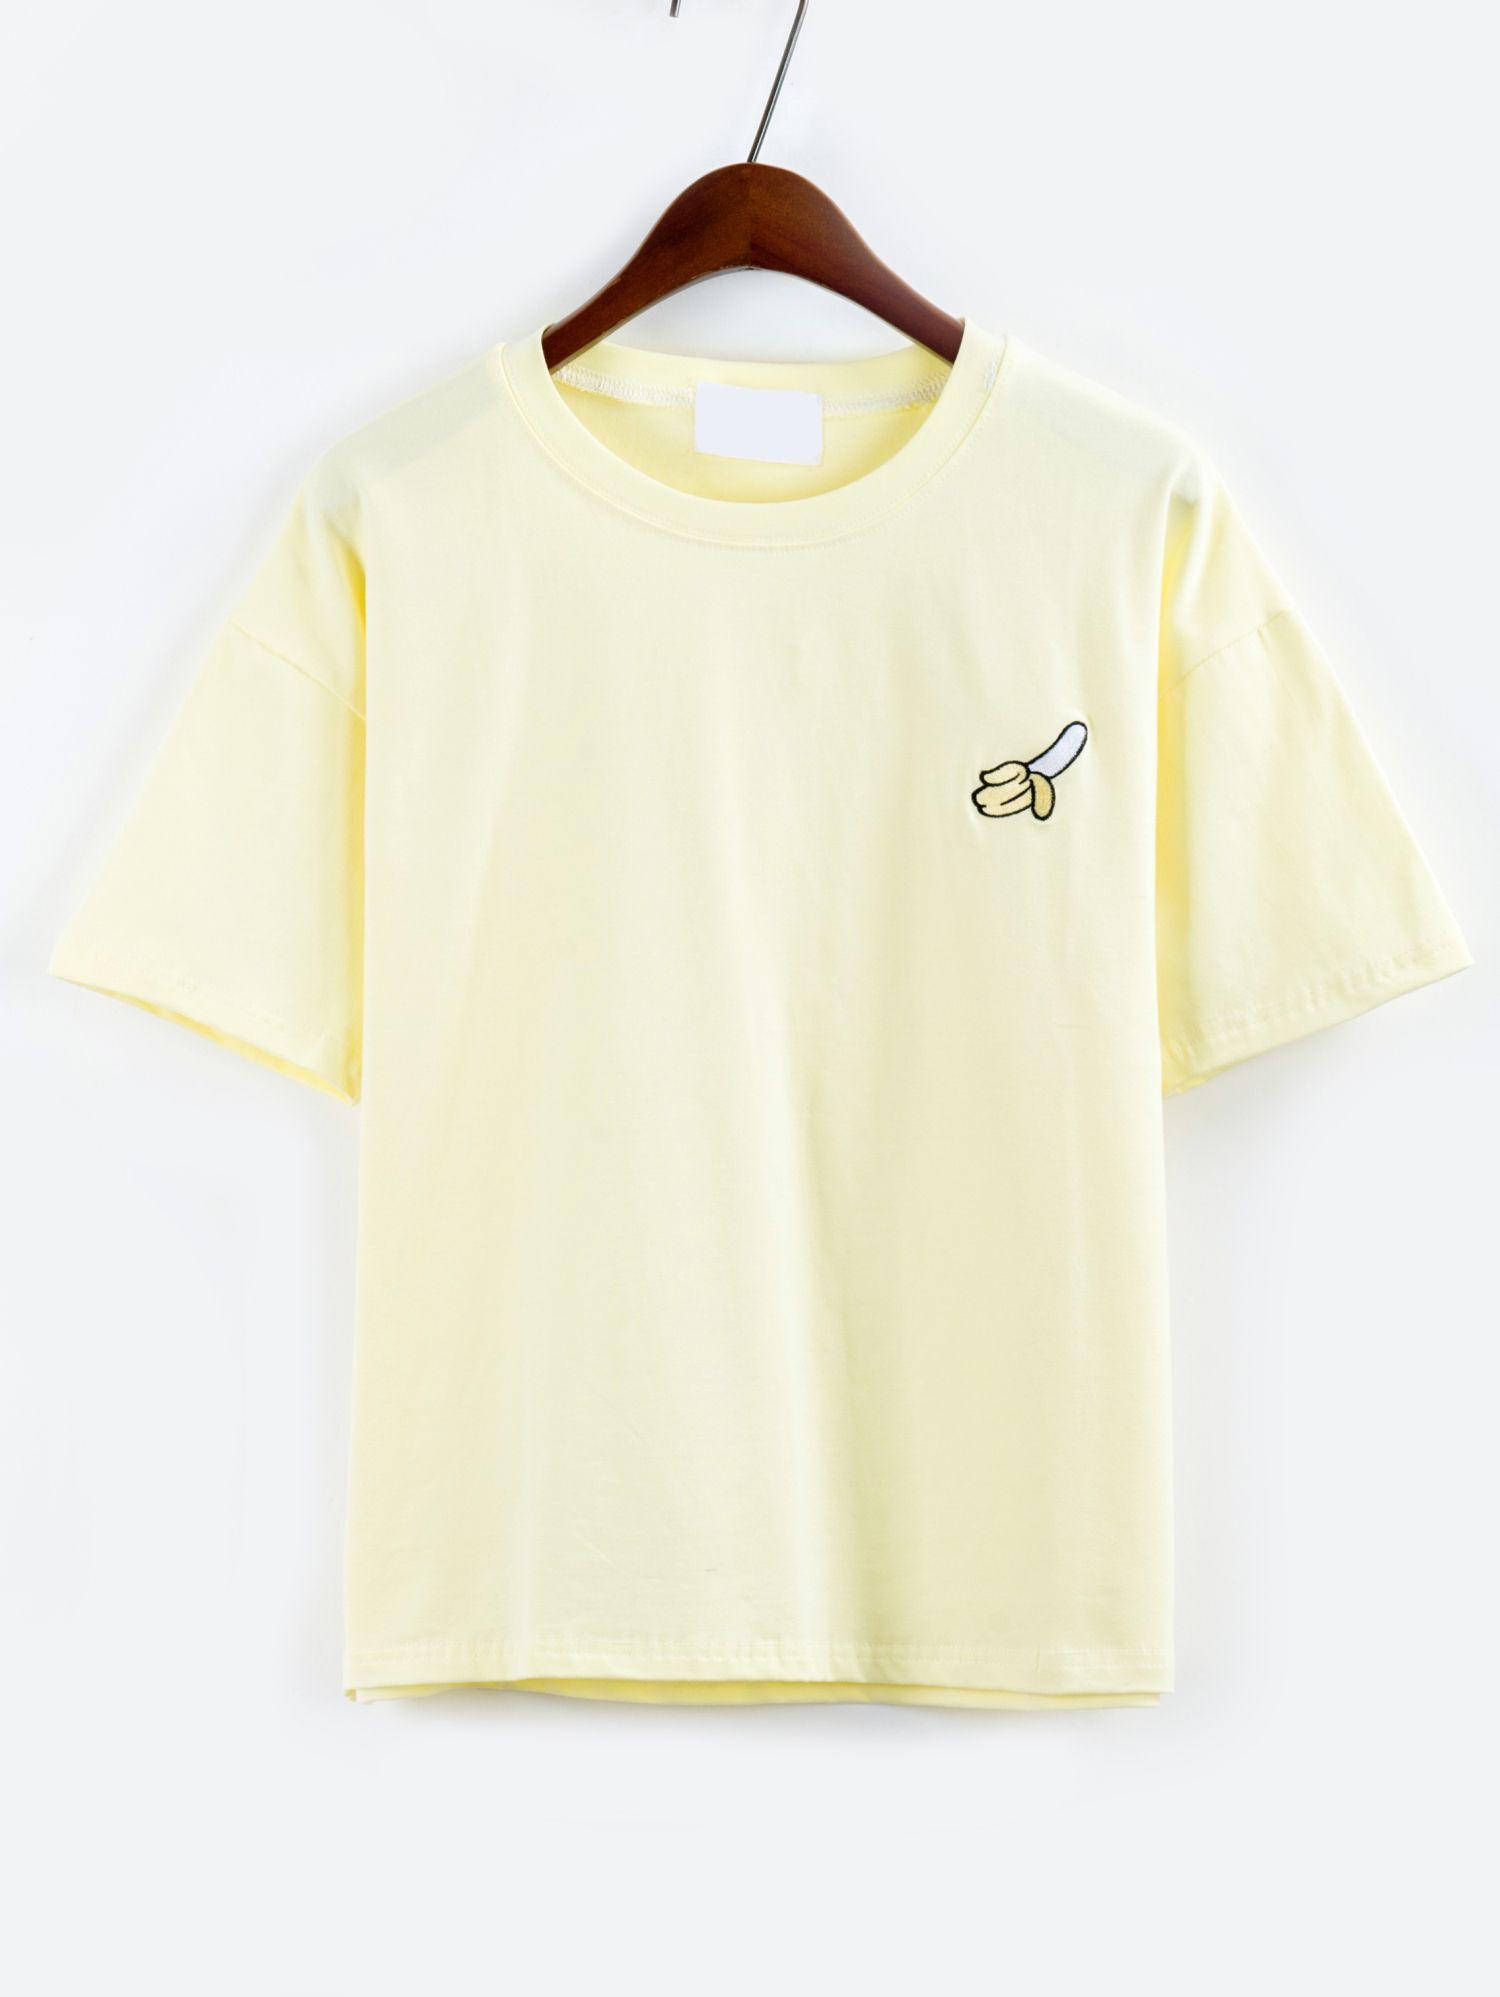 867ff9e9e Shop Banana Embroidered Drop Shoulder Yellow T-shirt online. SheIn offers  Banana Embroidered Drop Shoulder Yellow T-shirt & more to fit your  fashionable ...